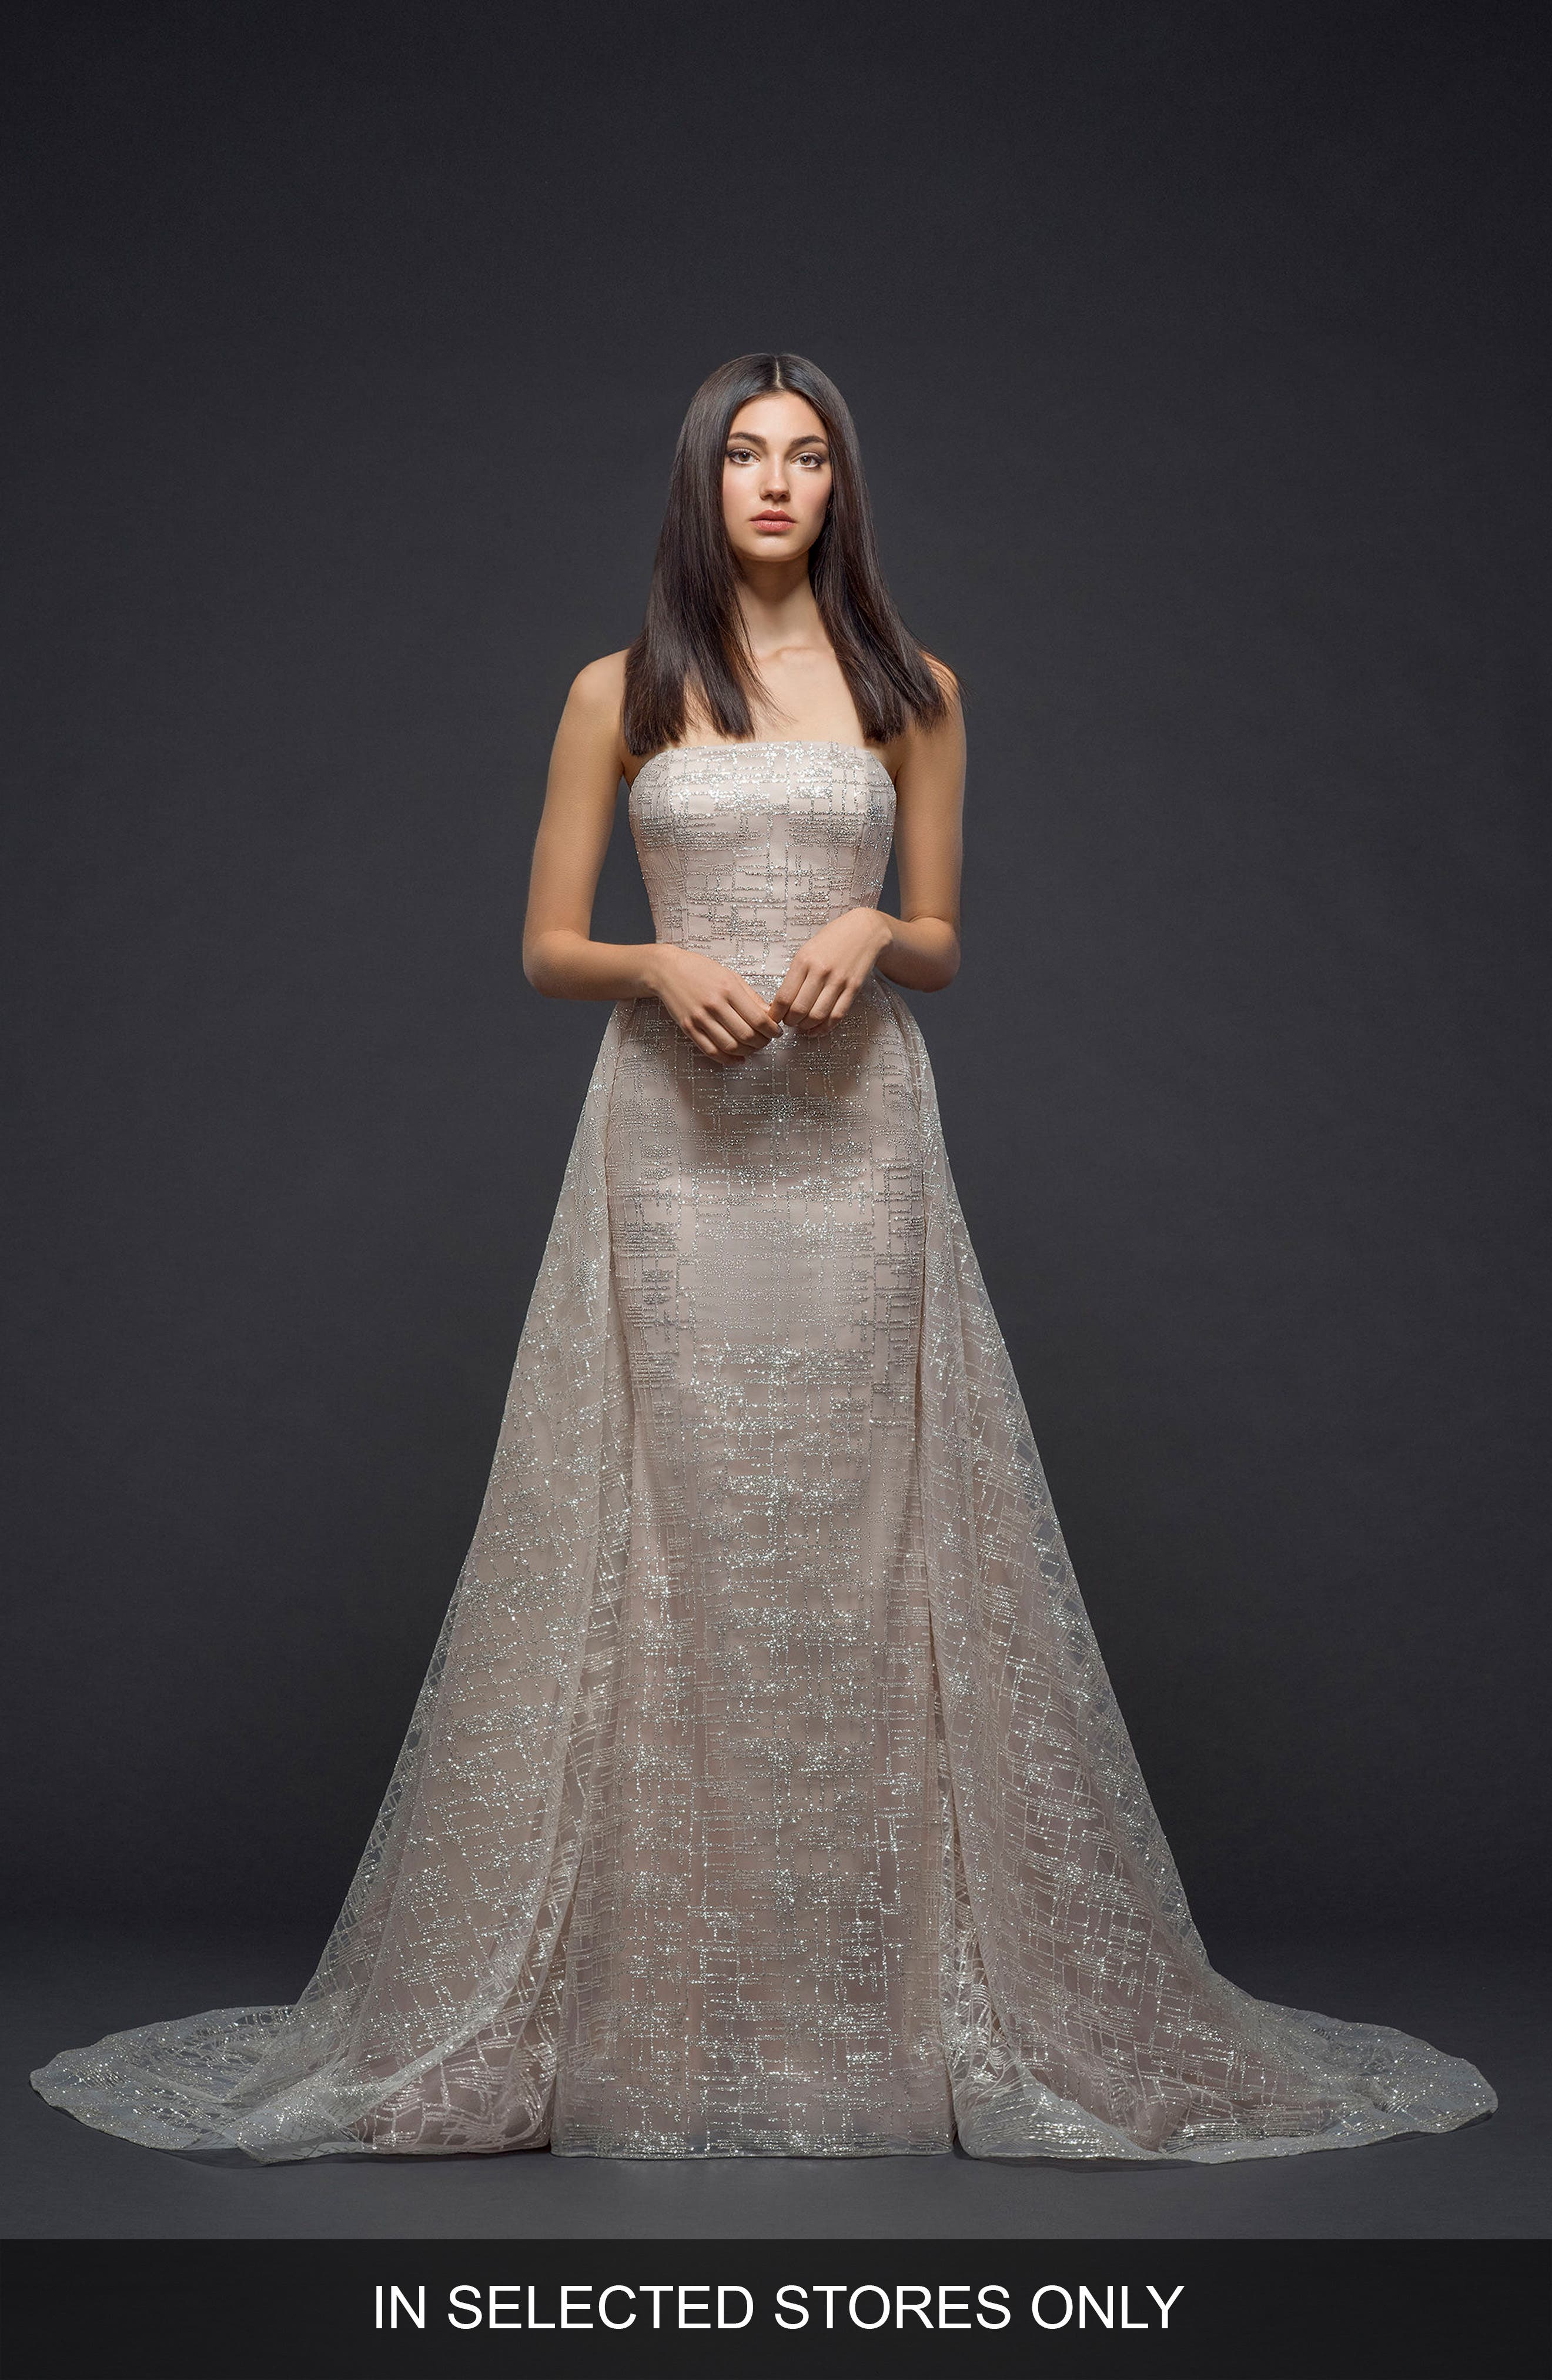 Sparkle Plaid Strapless Gown,                             Main thumbnail 1, color,                             NUDE